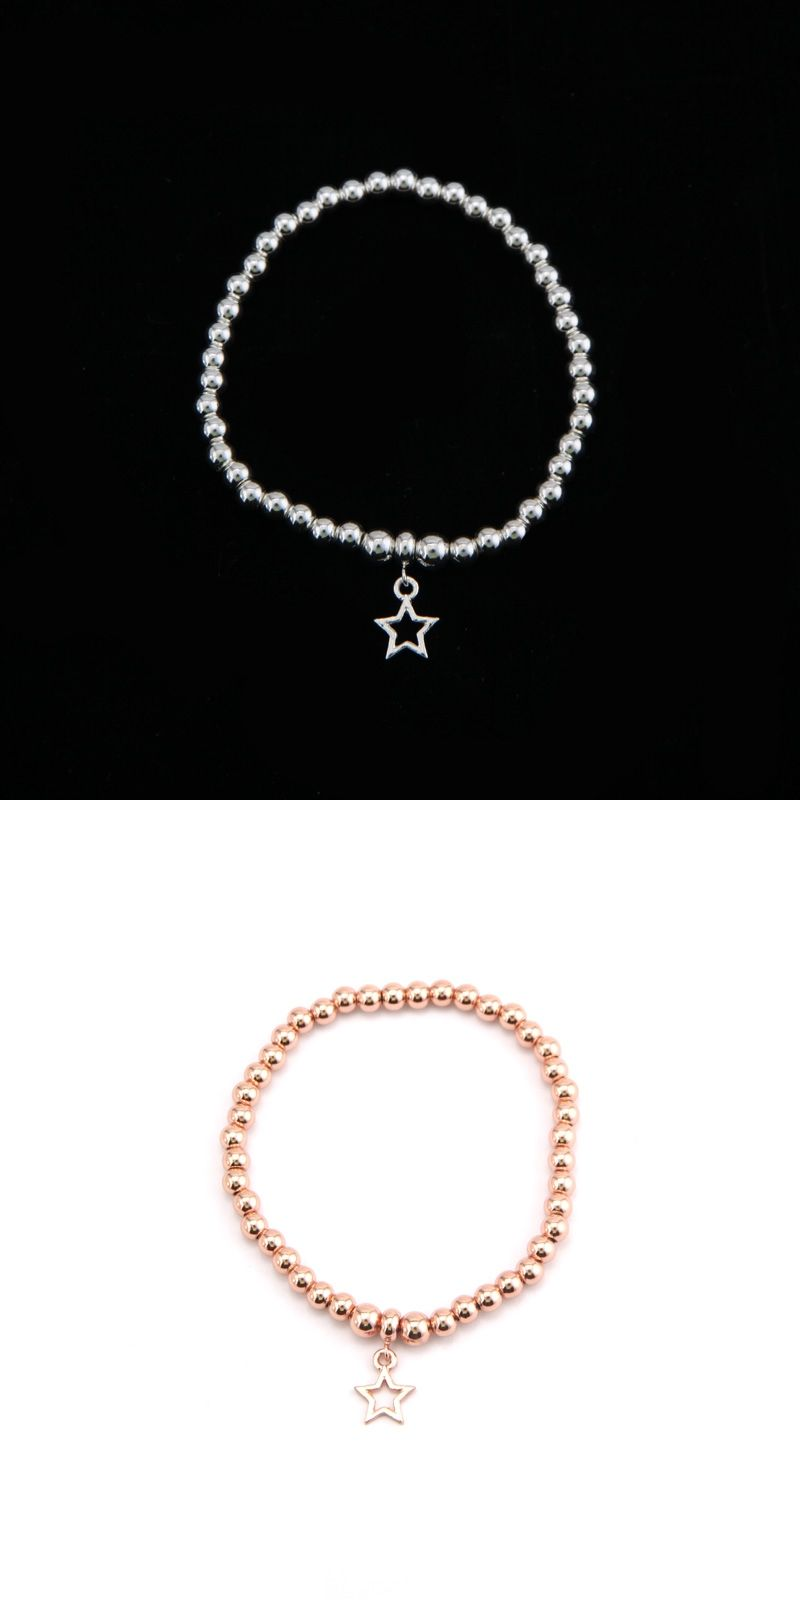 Sanshoor rose gold mm beads joma women jewelry shamballa bracelets